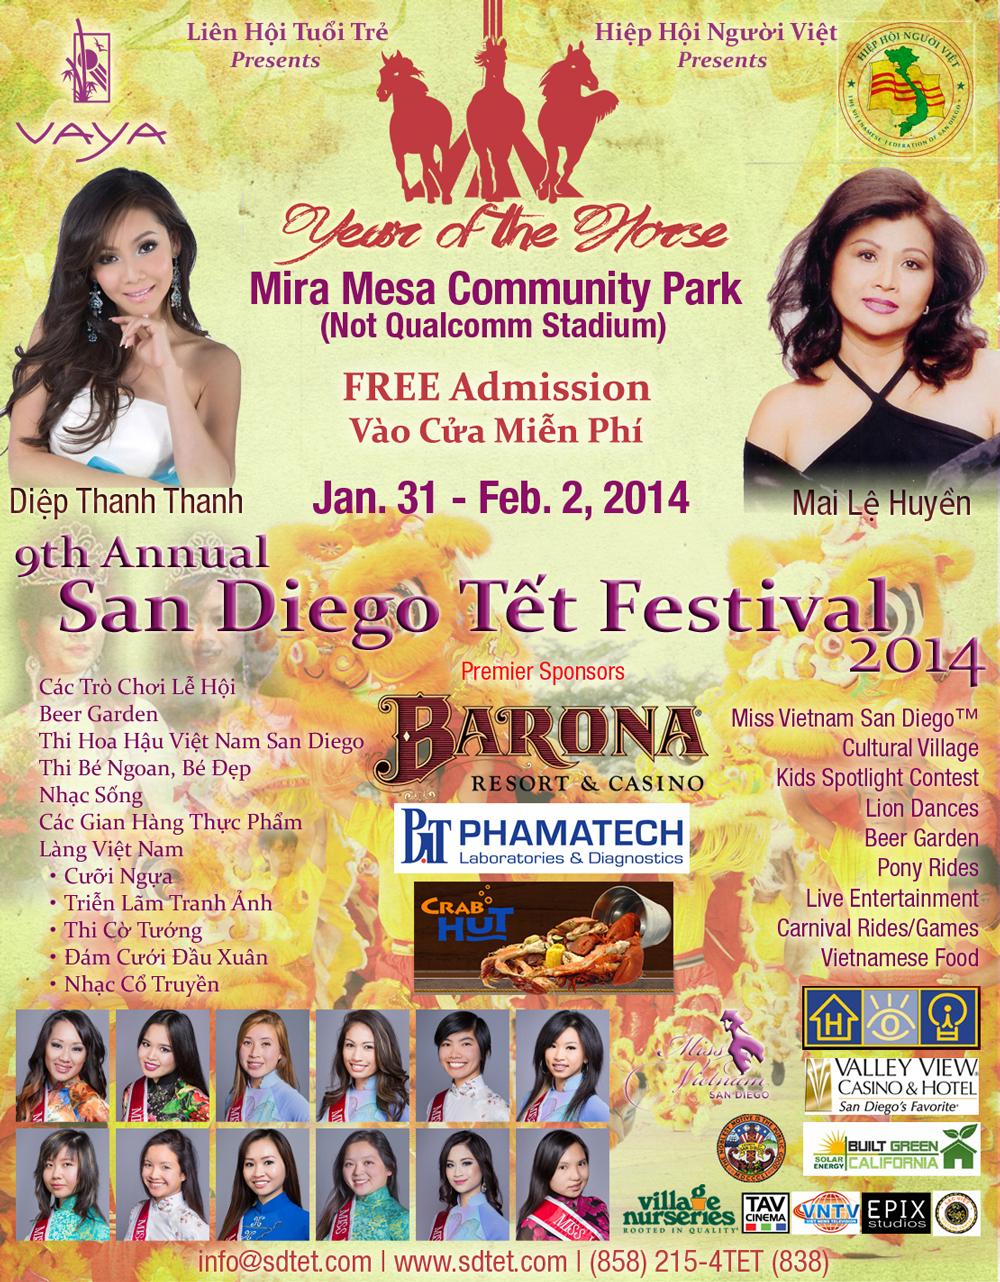 San Diego Tet Festival